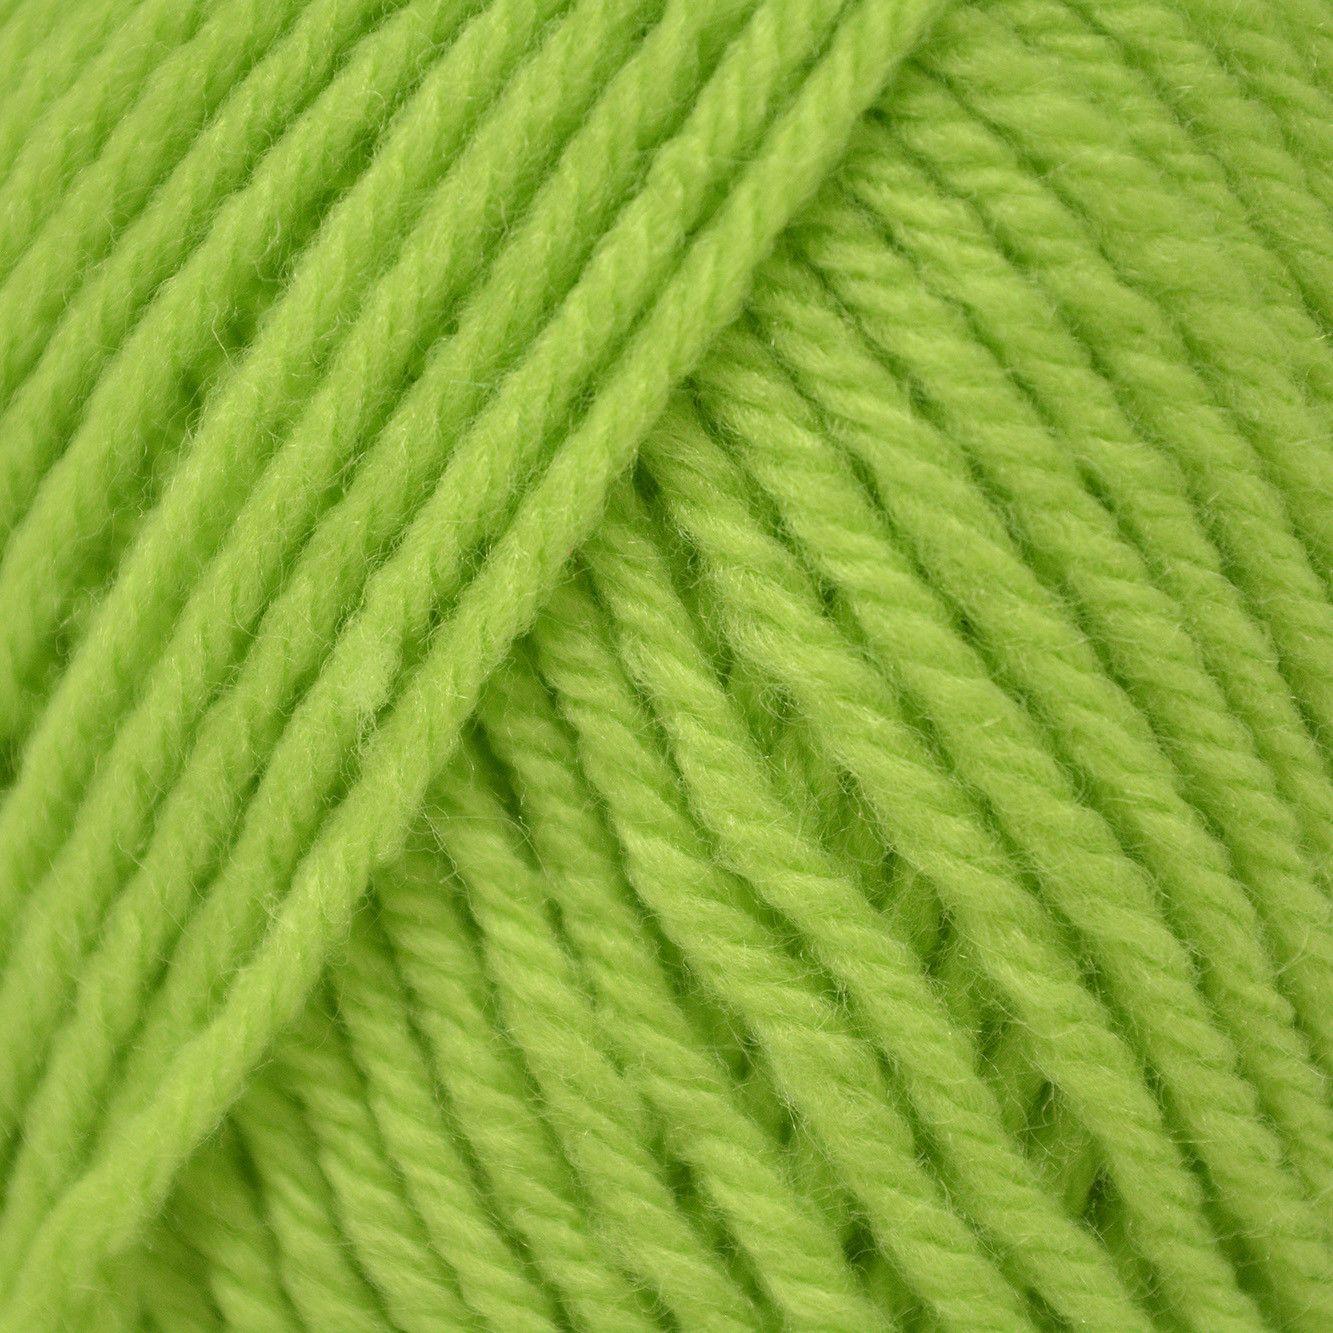 Sirdar Snuggly Dk 50g Whizz 483 The Knitting Network